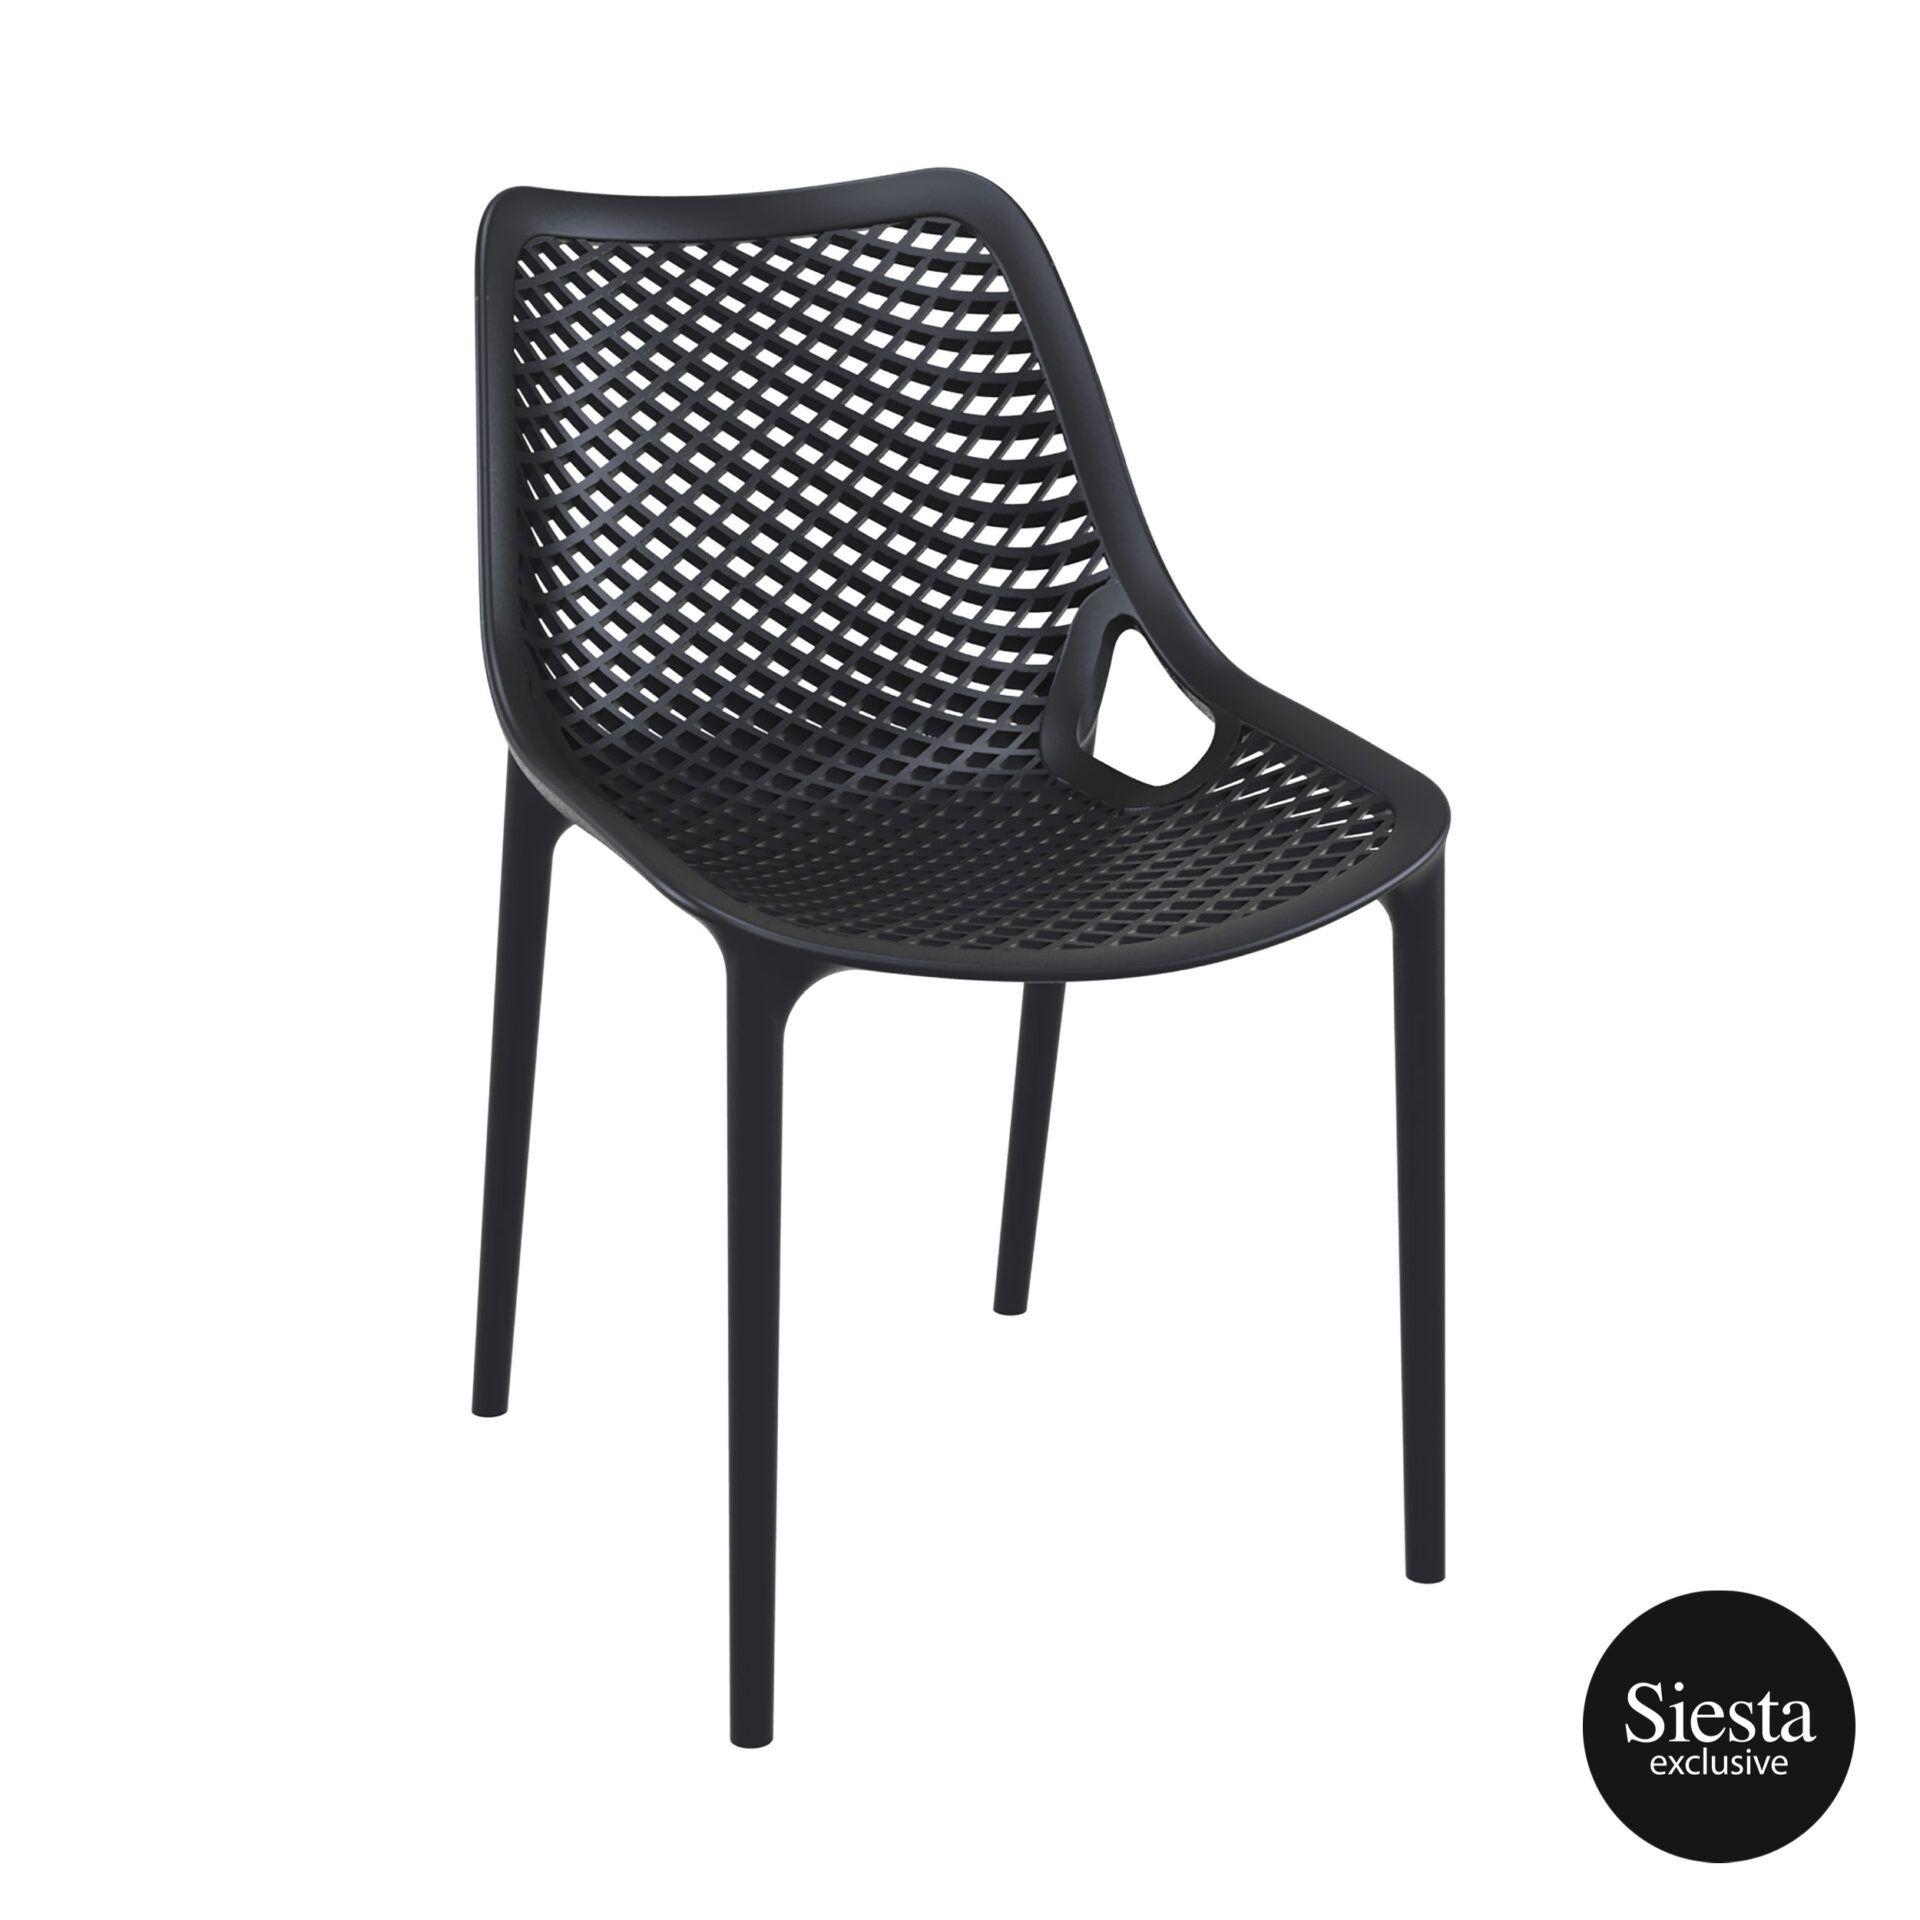 original siesta air chair black front side